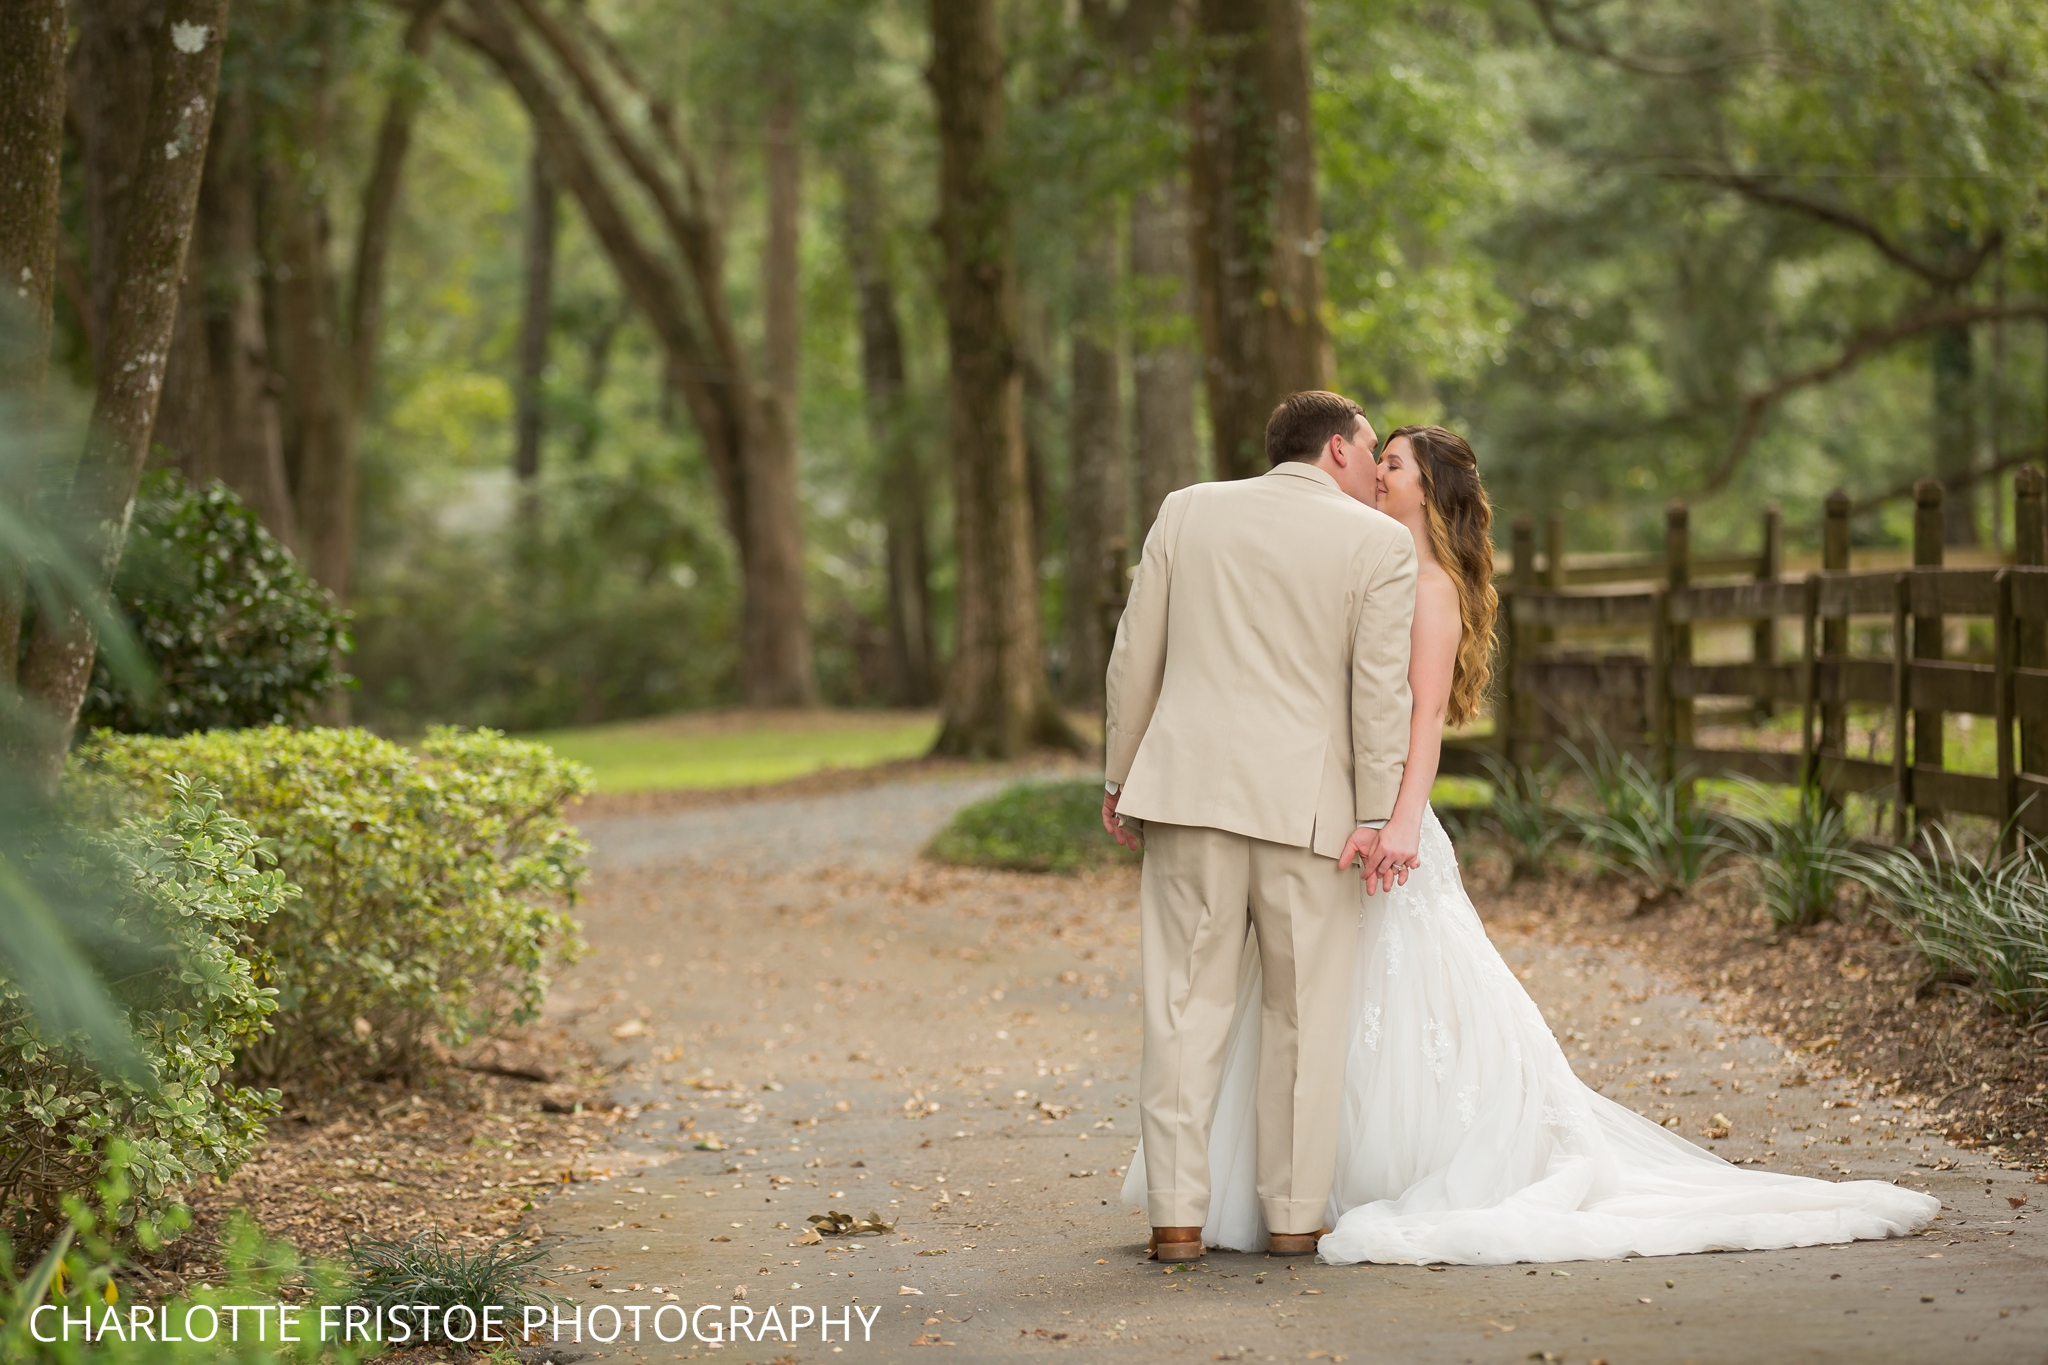 Tallahassee_Wedding_Charlotte_Fristoe-55.jpg